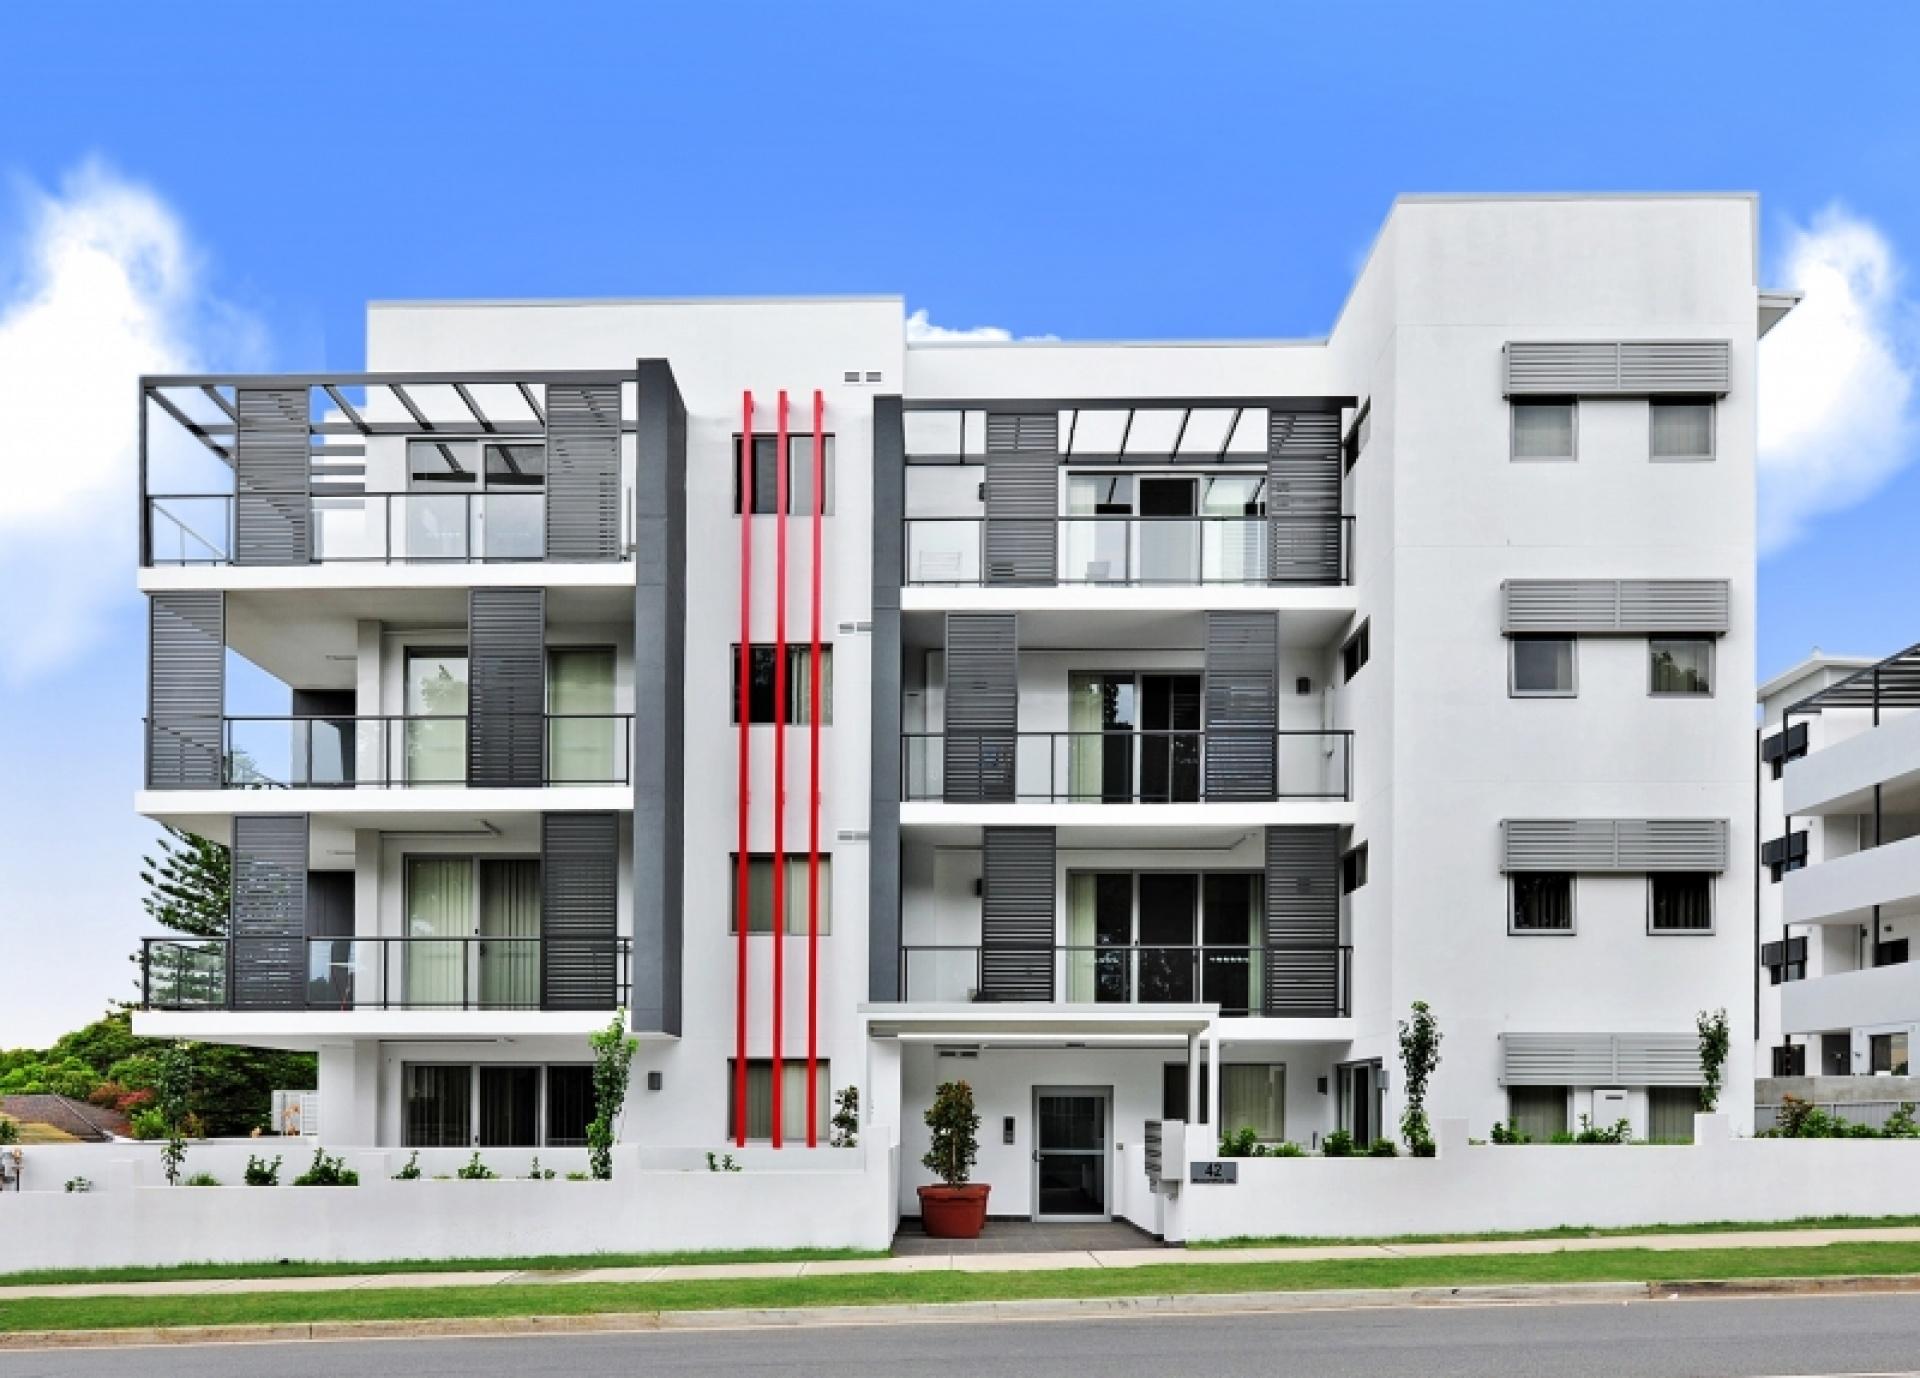 1 Bedrooms, Apartment, Sold , Macarthur Street, 1 Bathrooms, Listing ID 1124, Parramatta, NSW, Australia,